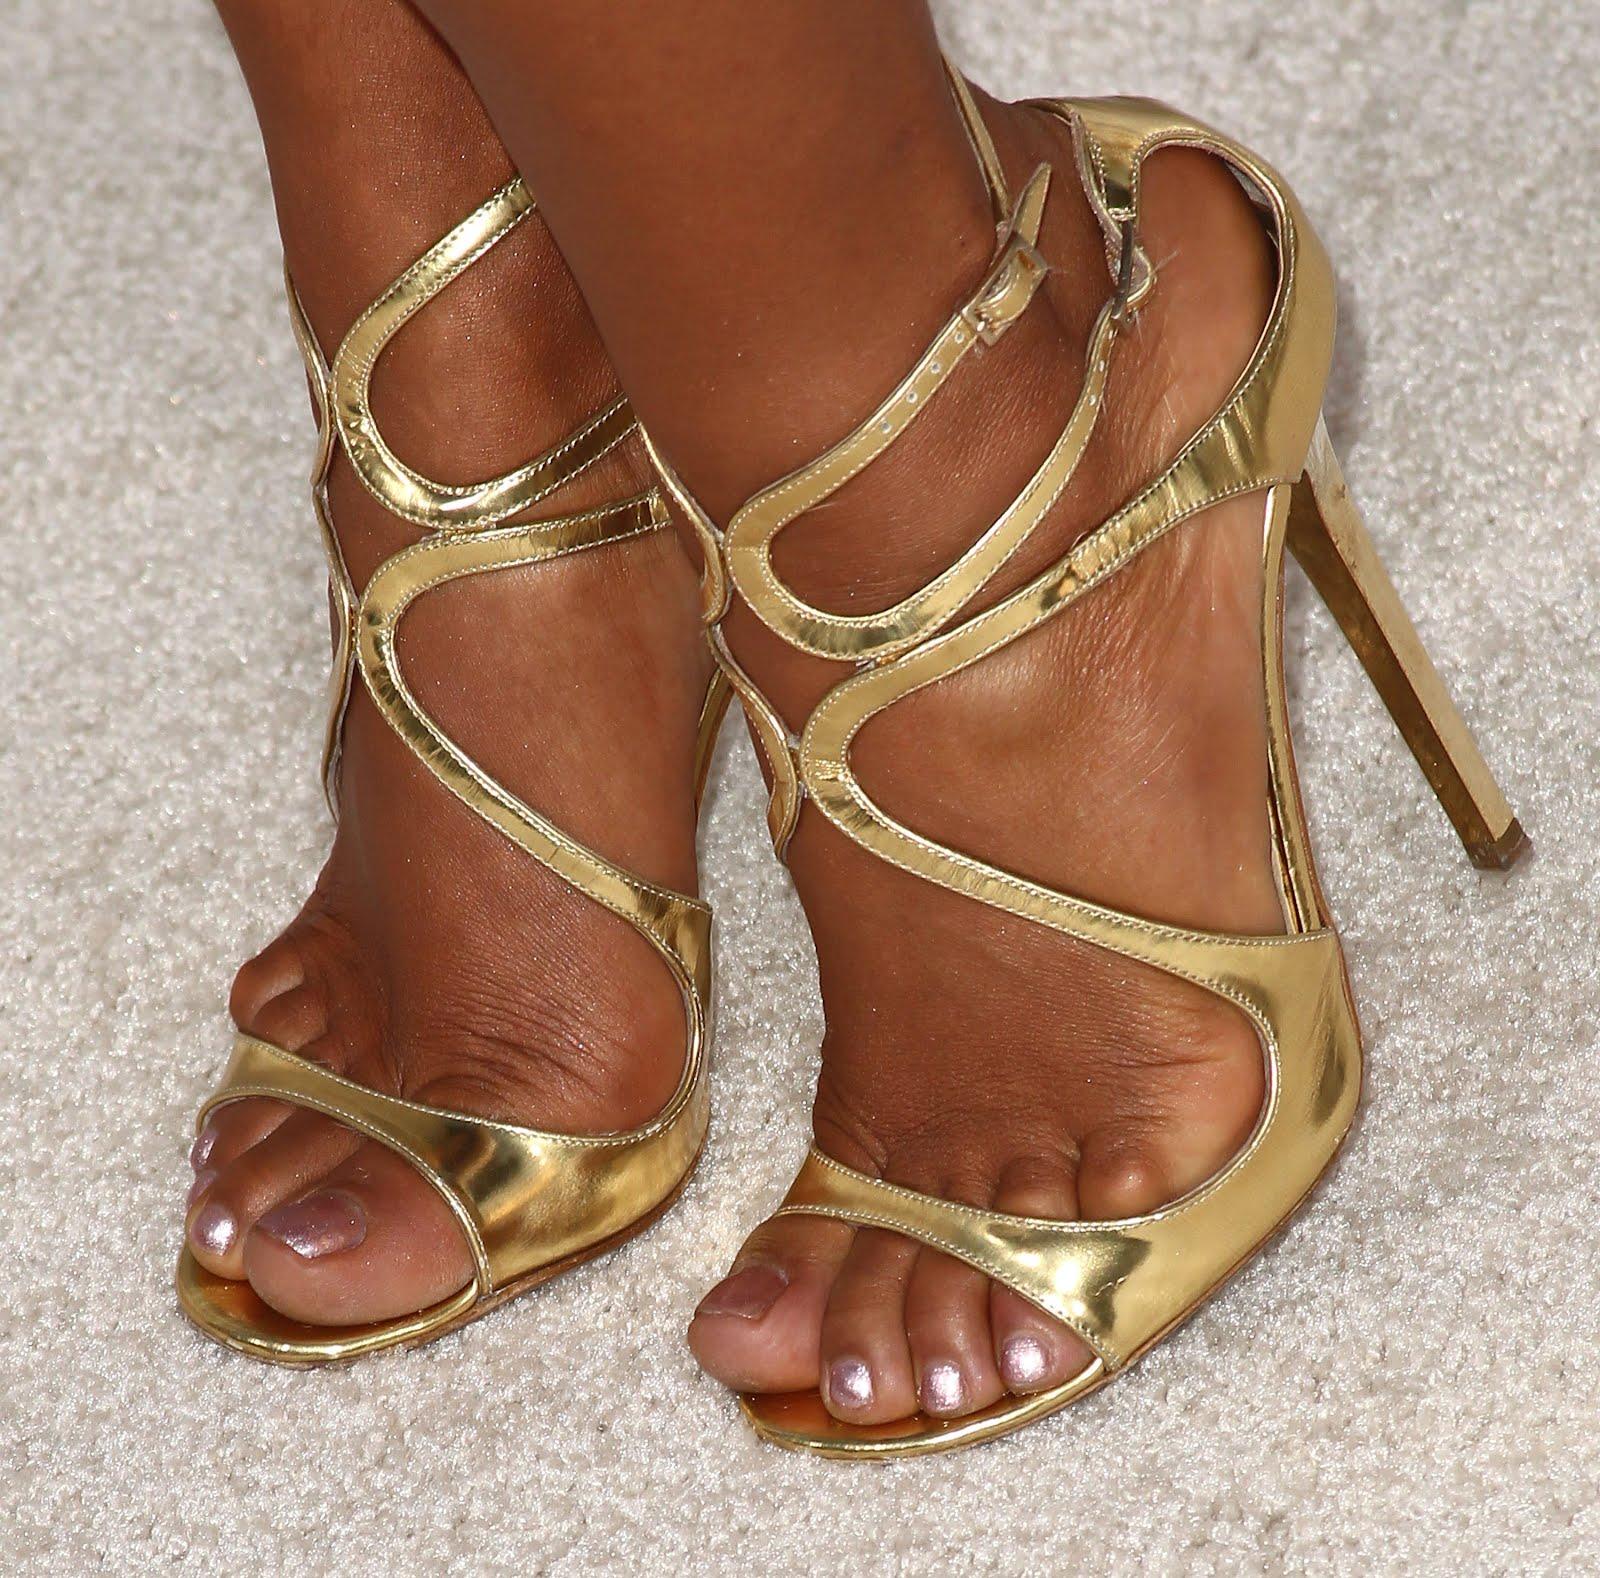 http://4.bp.blogspot.com/-k7cxJRpfPIo/UBp-jSrWbKI/AAAAAAAAATU/lC_7oIomNDc/s1600/Christina_Milian_Feet_001.jpg